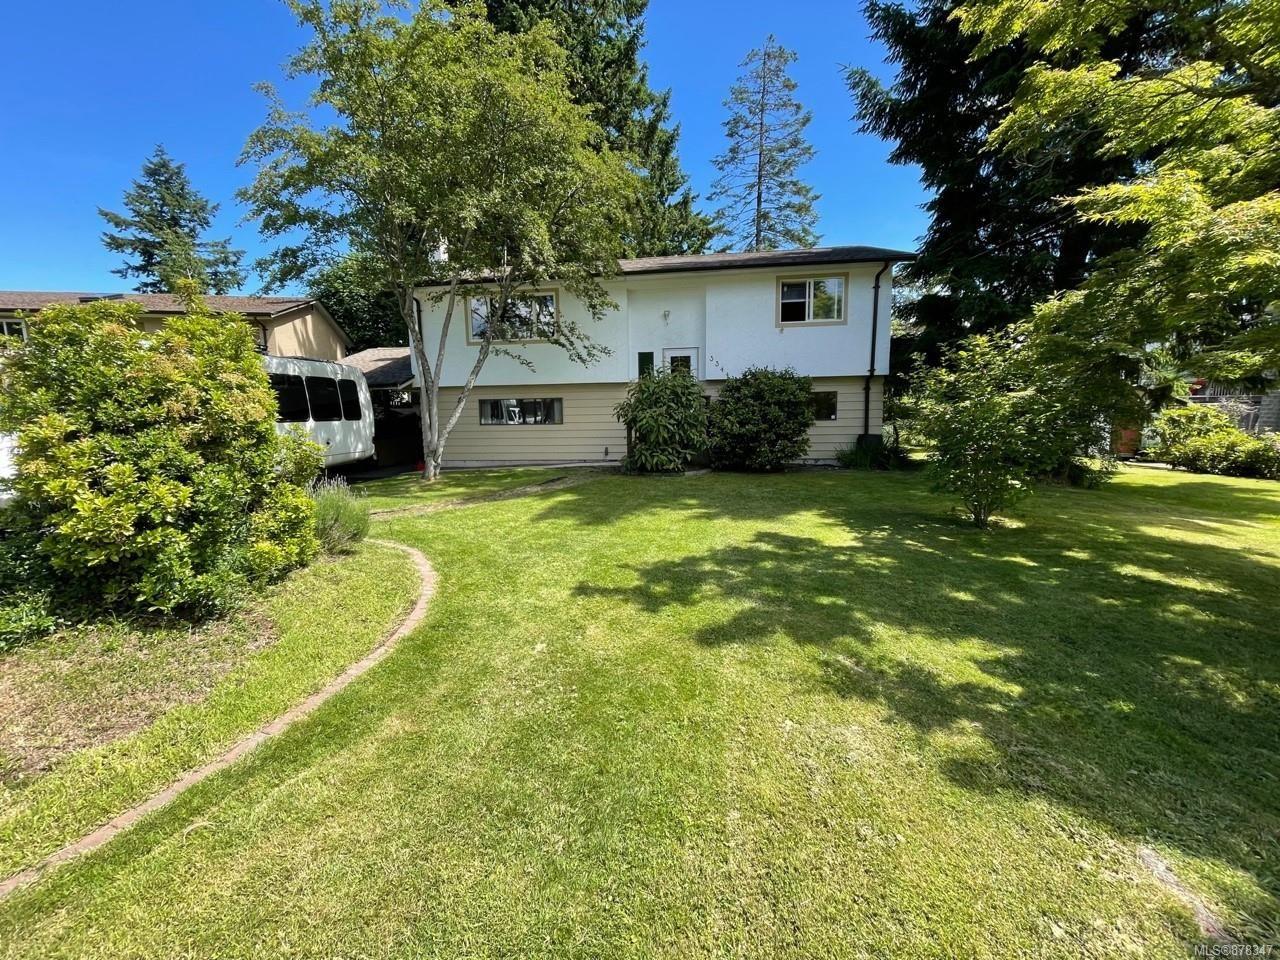 Main Photo: 334 Texada Pl in : CV Comox (Town of) House for sale (Comox Valley)  : MLS®# 878347